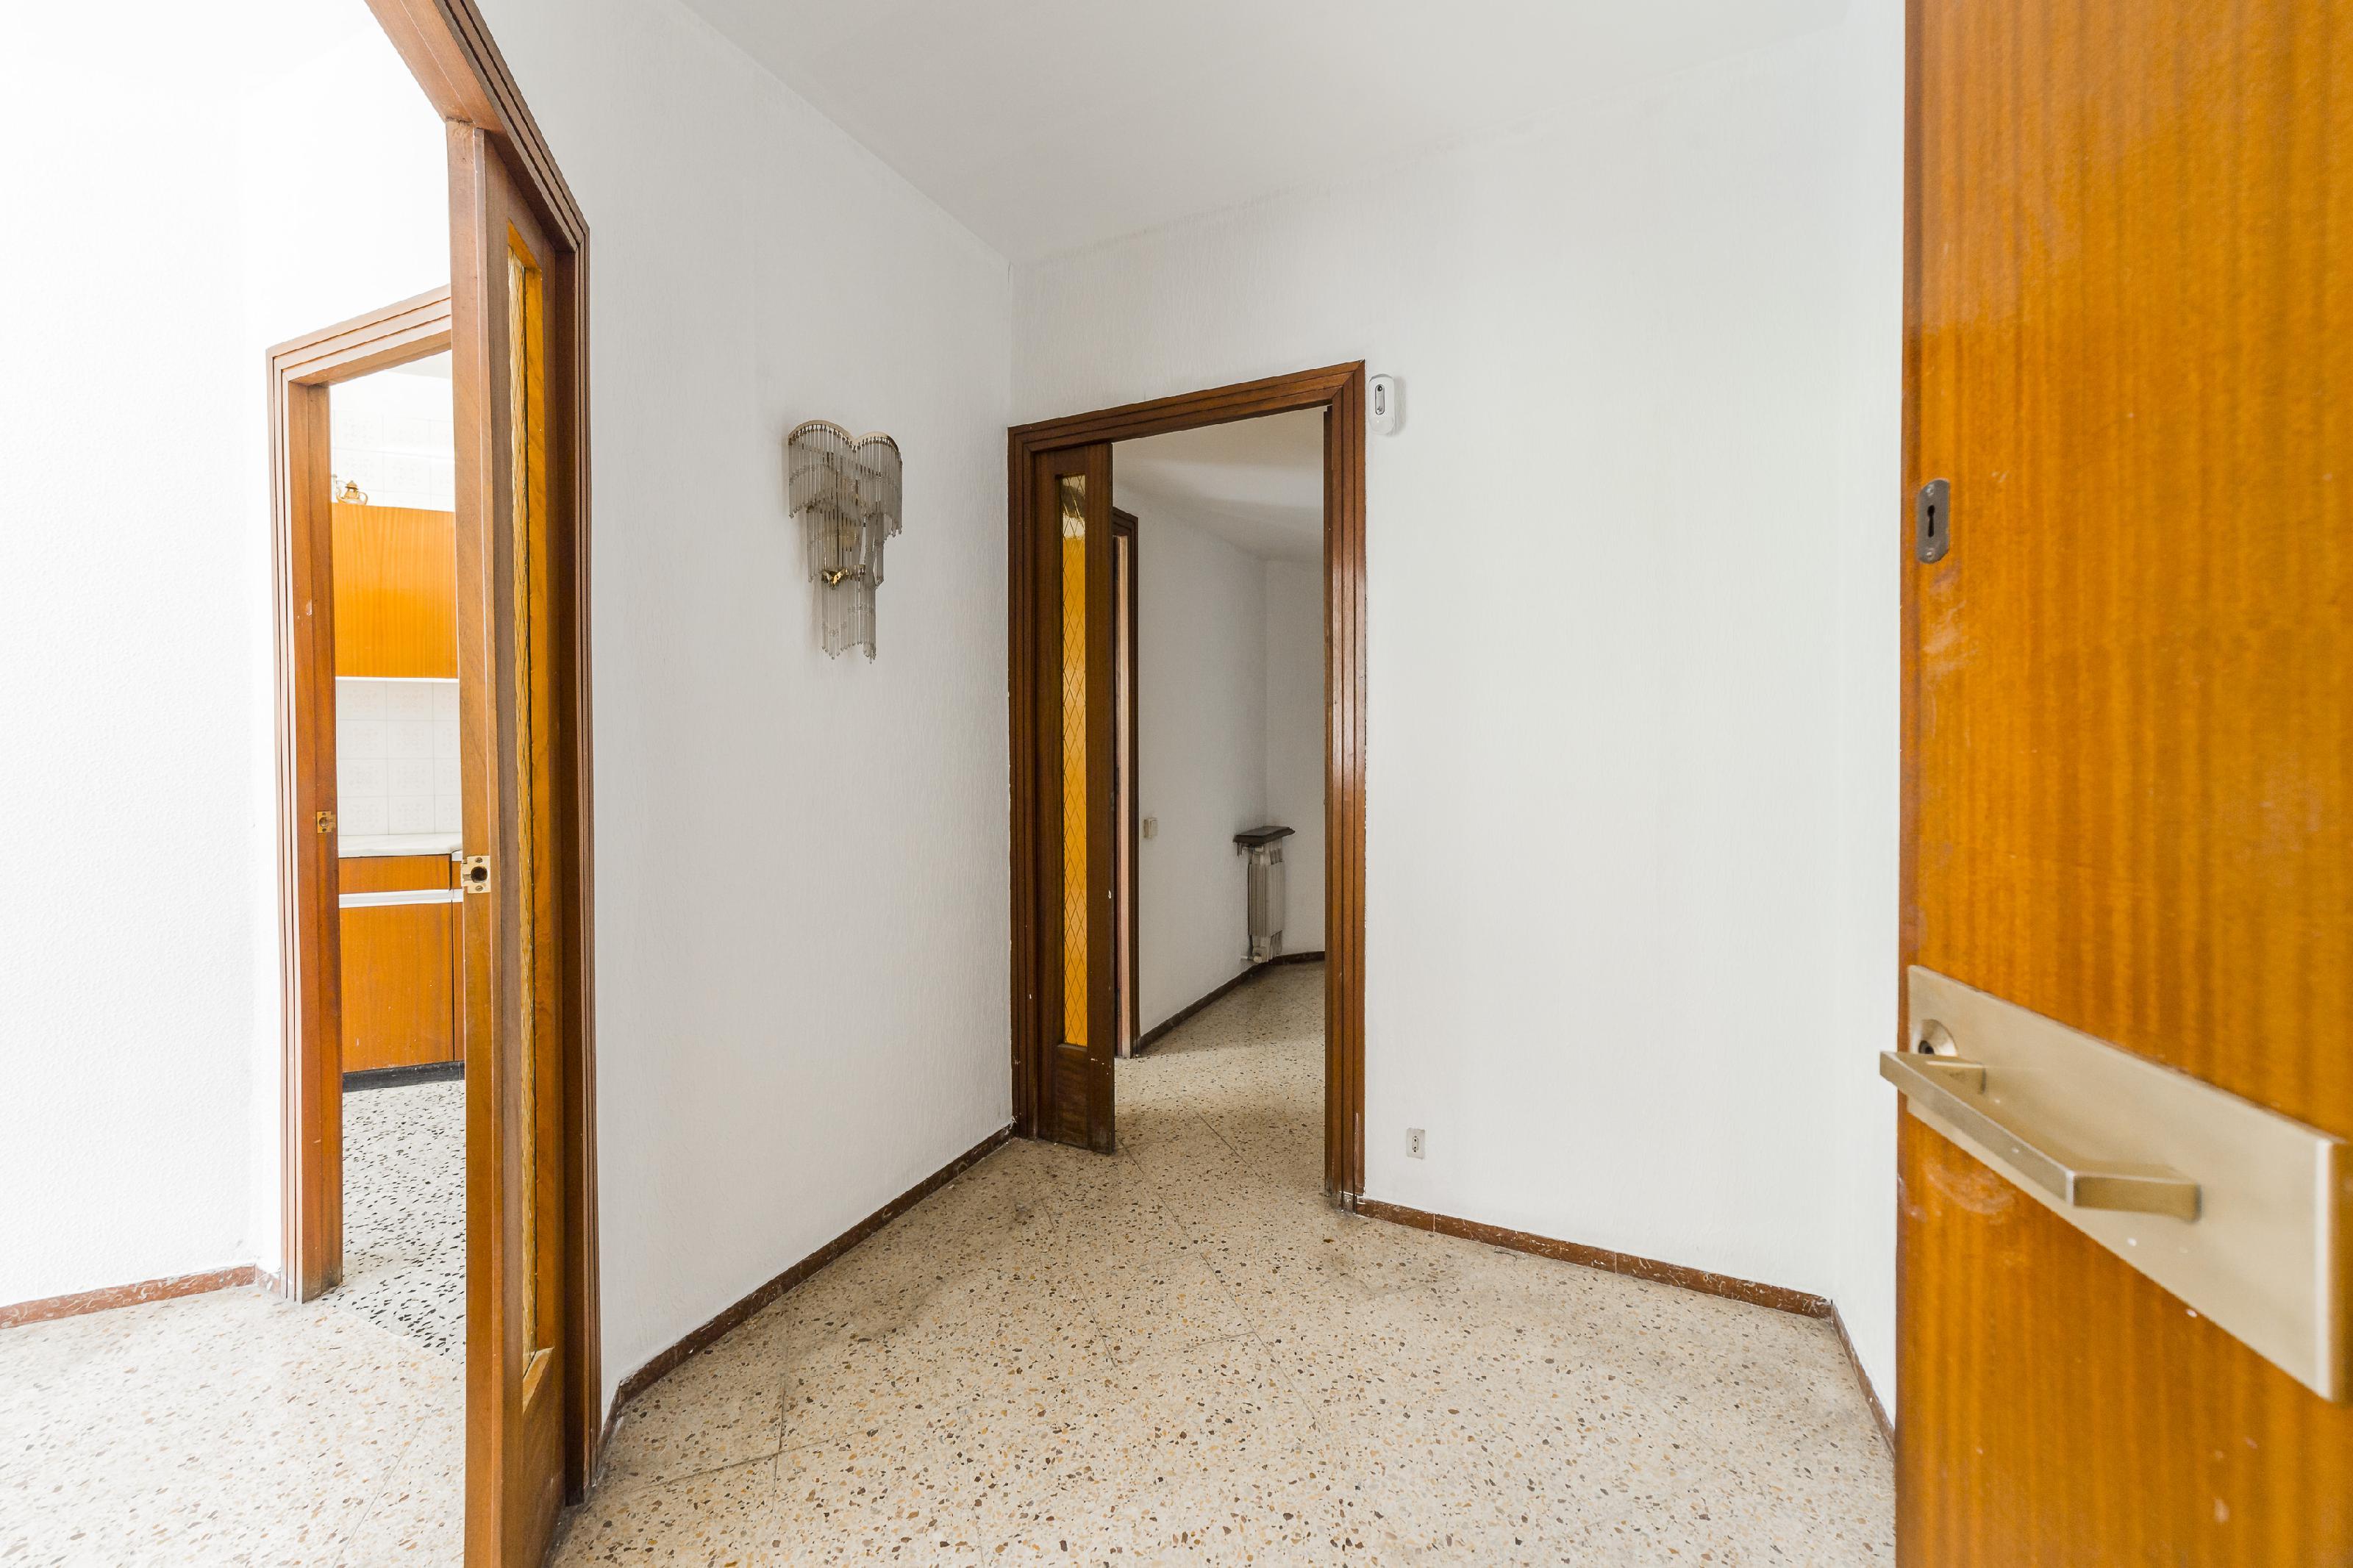 247624 Flat for sale in Eixample, Sant Antoni 8